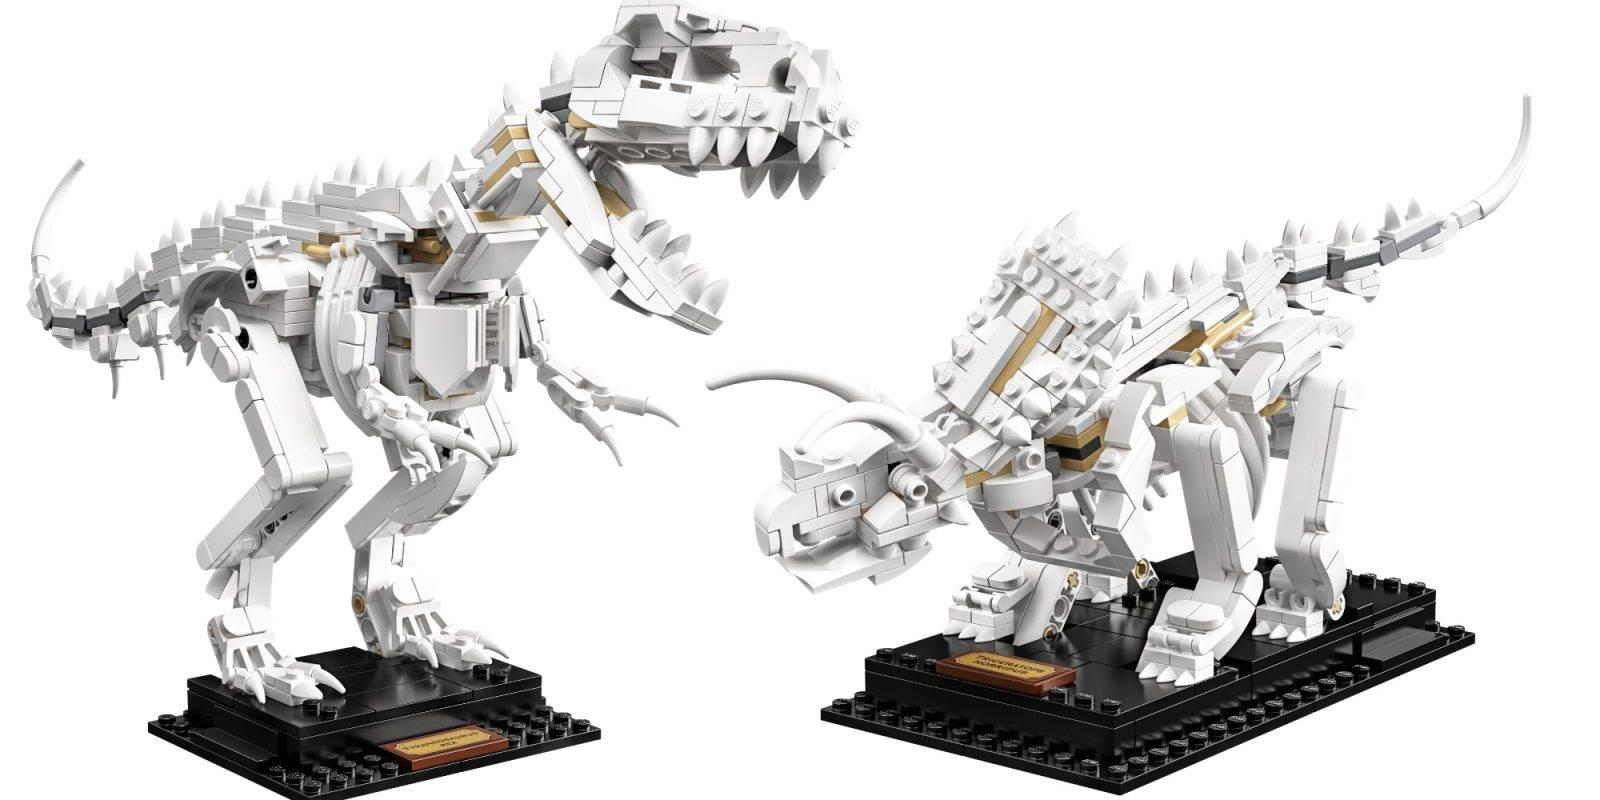 LEGO ideas - dinosaurs fossils